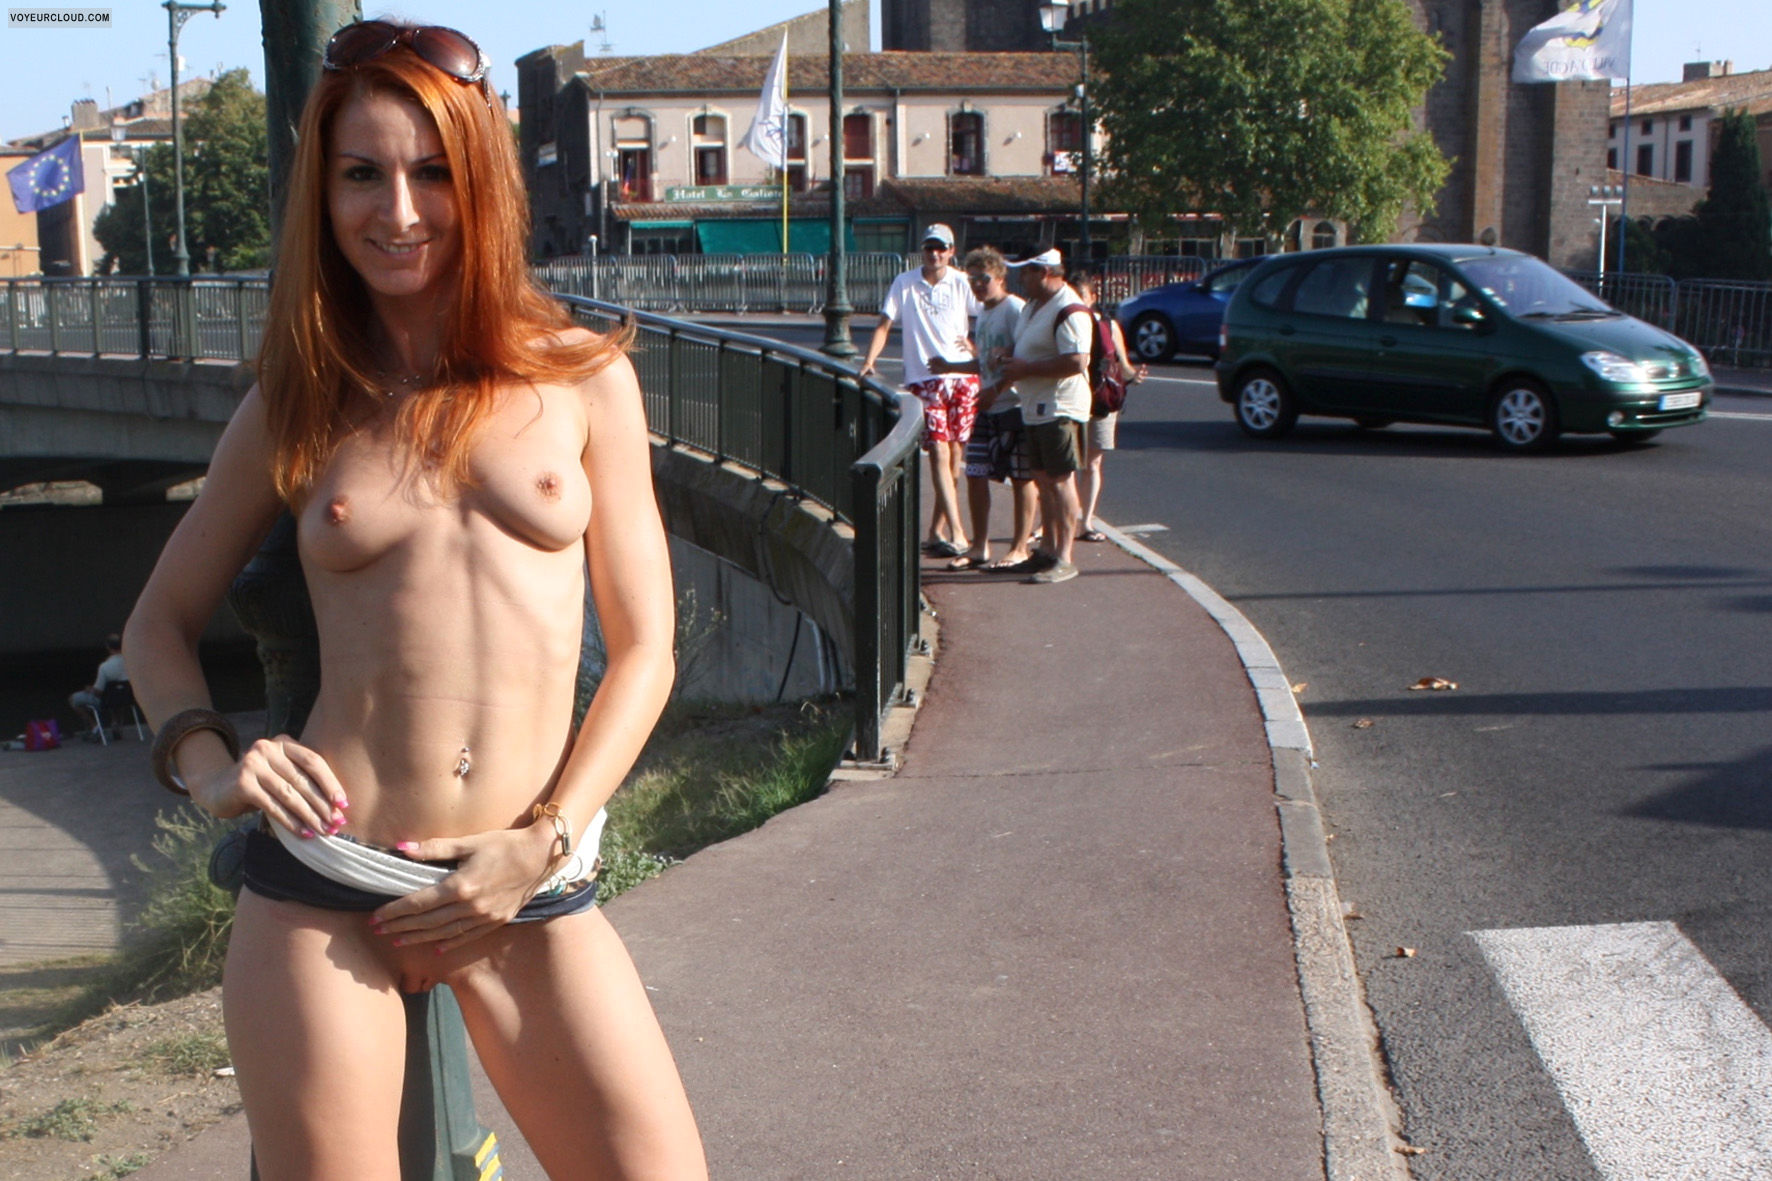 vienna-hungary-&-france-nude-public-09